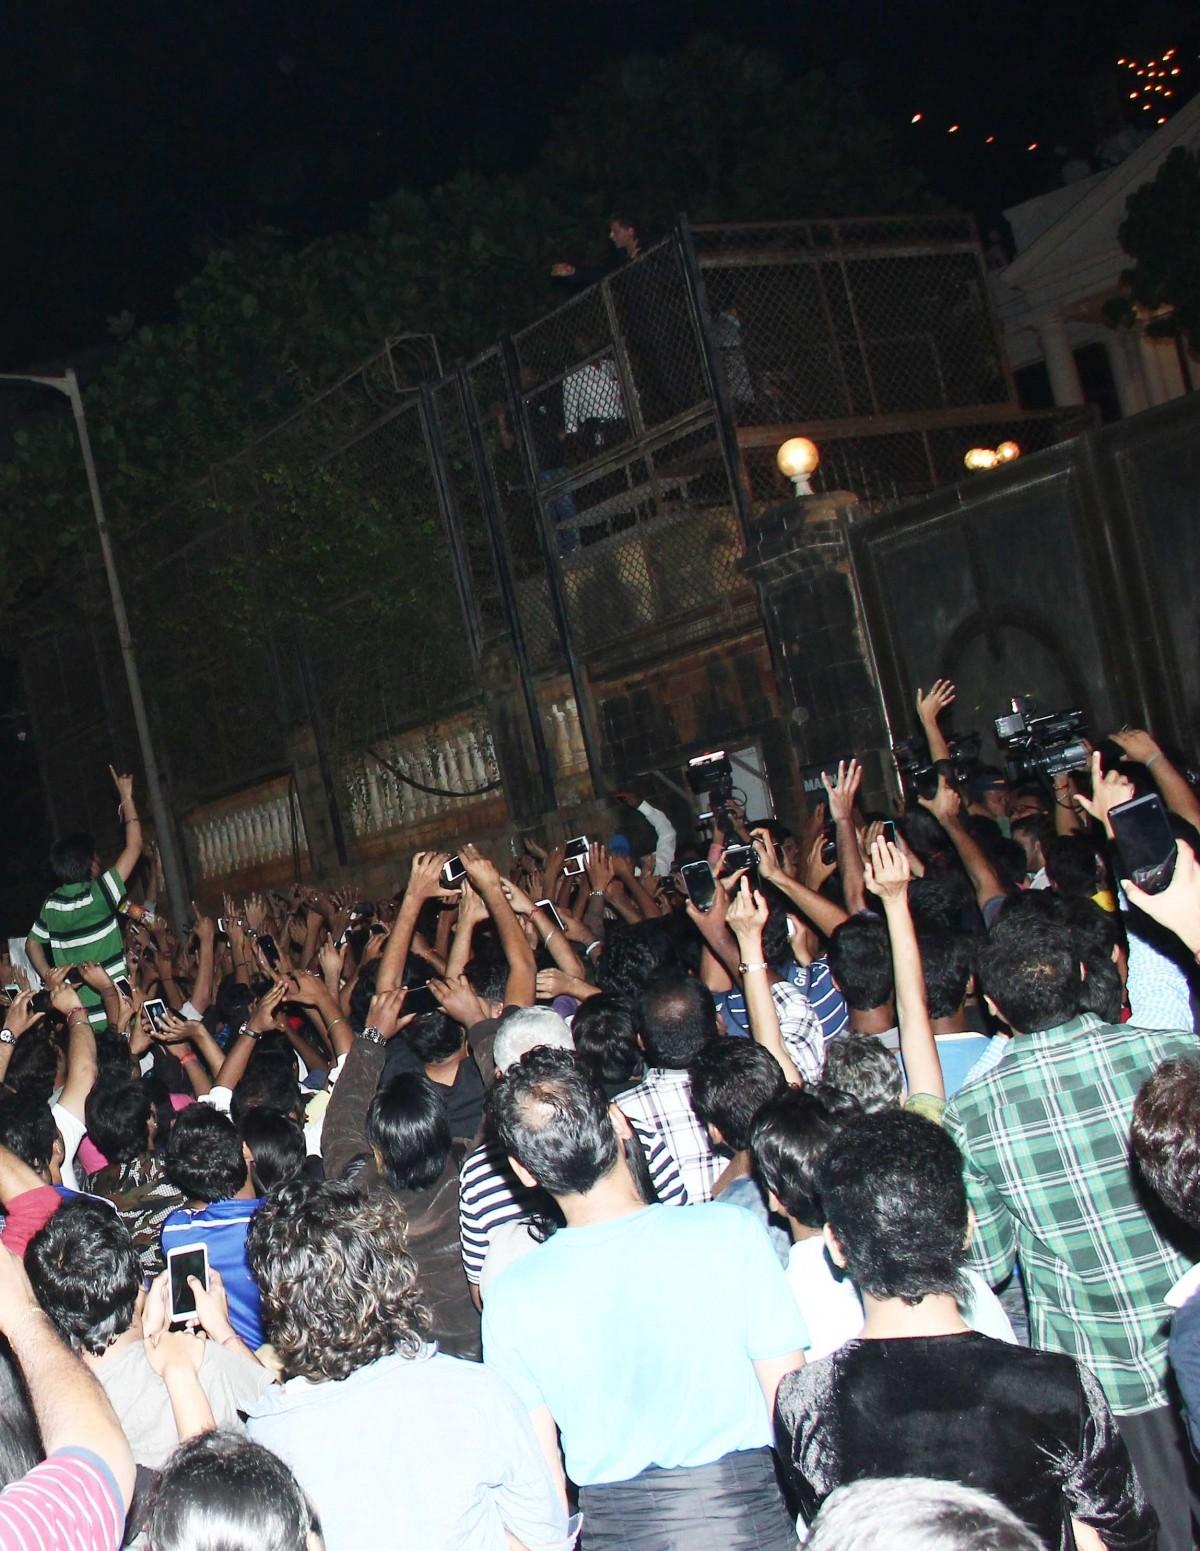 Shah Rukh Khan celebrates 49th birthday with fans waiting outside Mannat